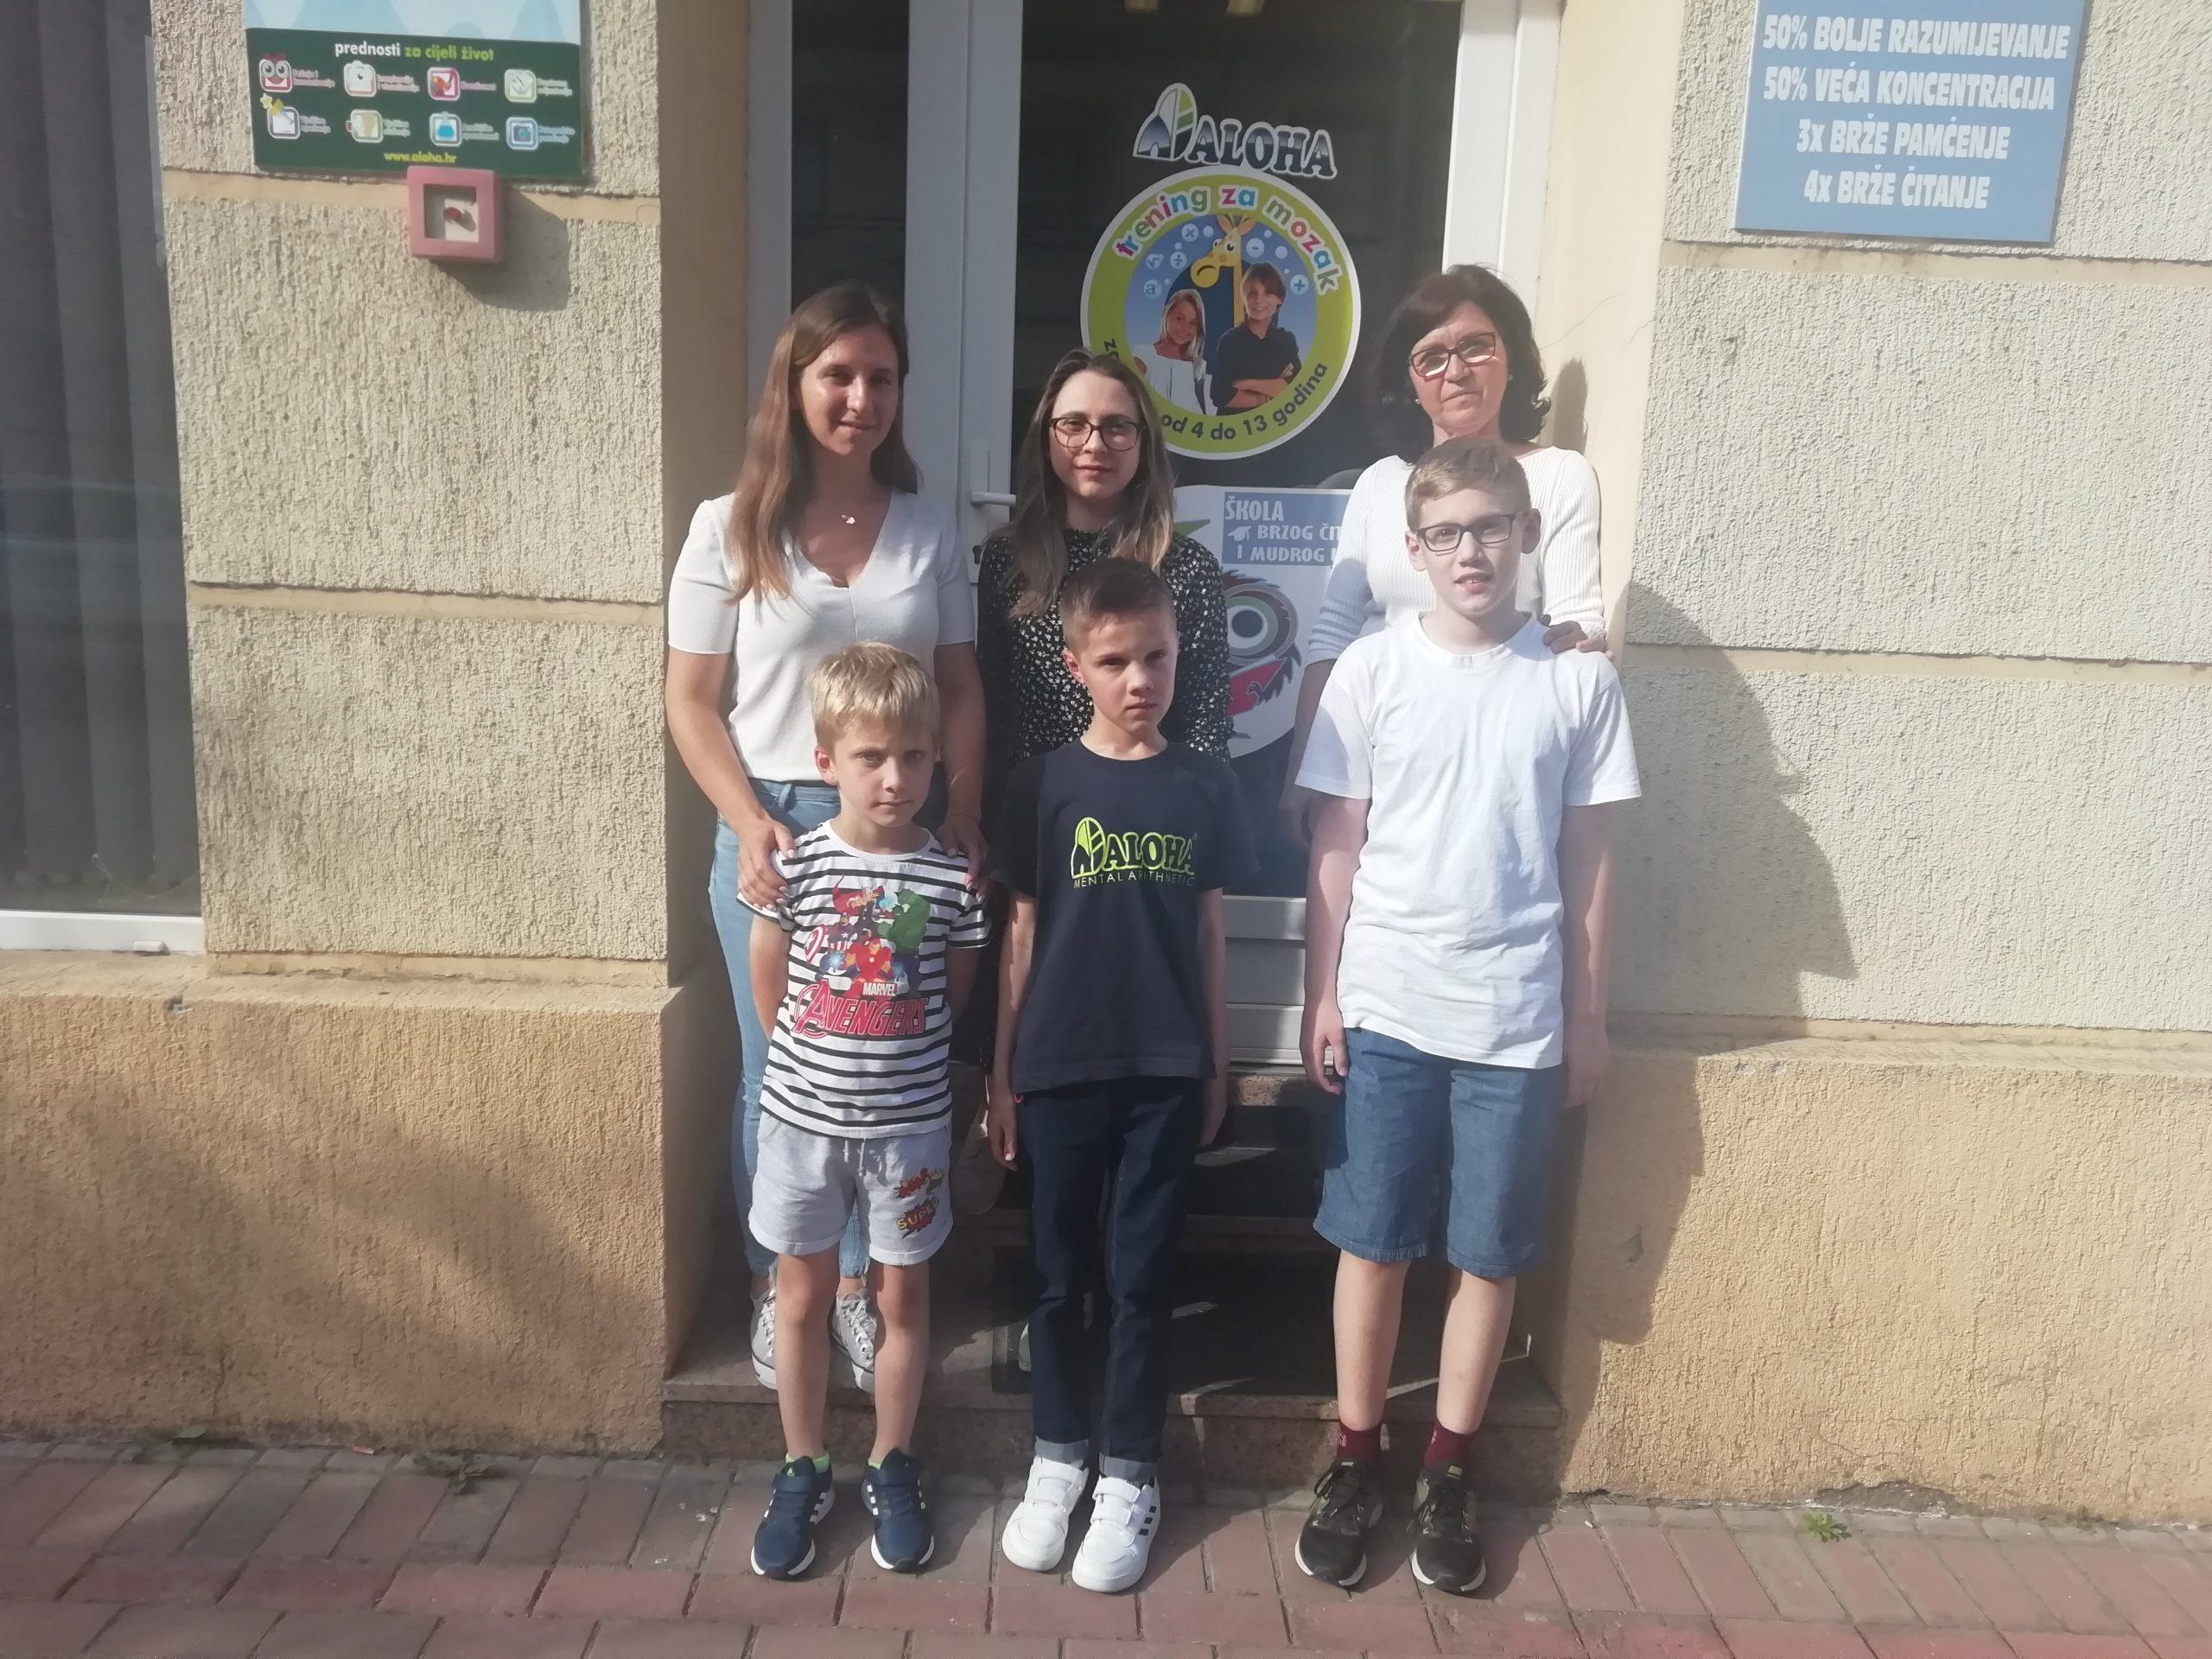 Fran, Tomislav i Filip ostvarili sjajne rezultate na državnom natjecanju mentalne aritmetike